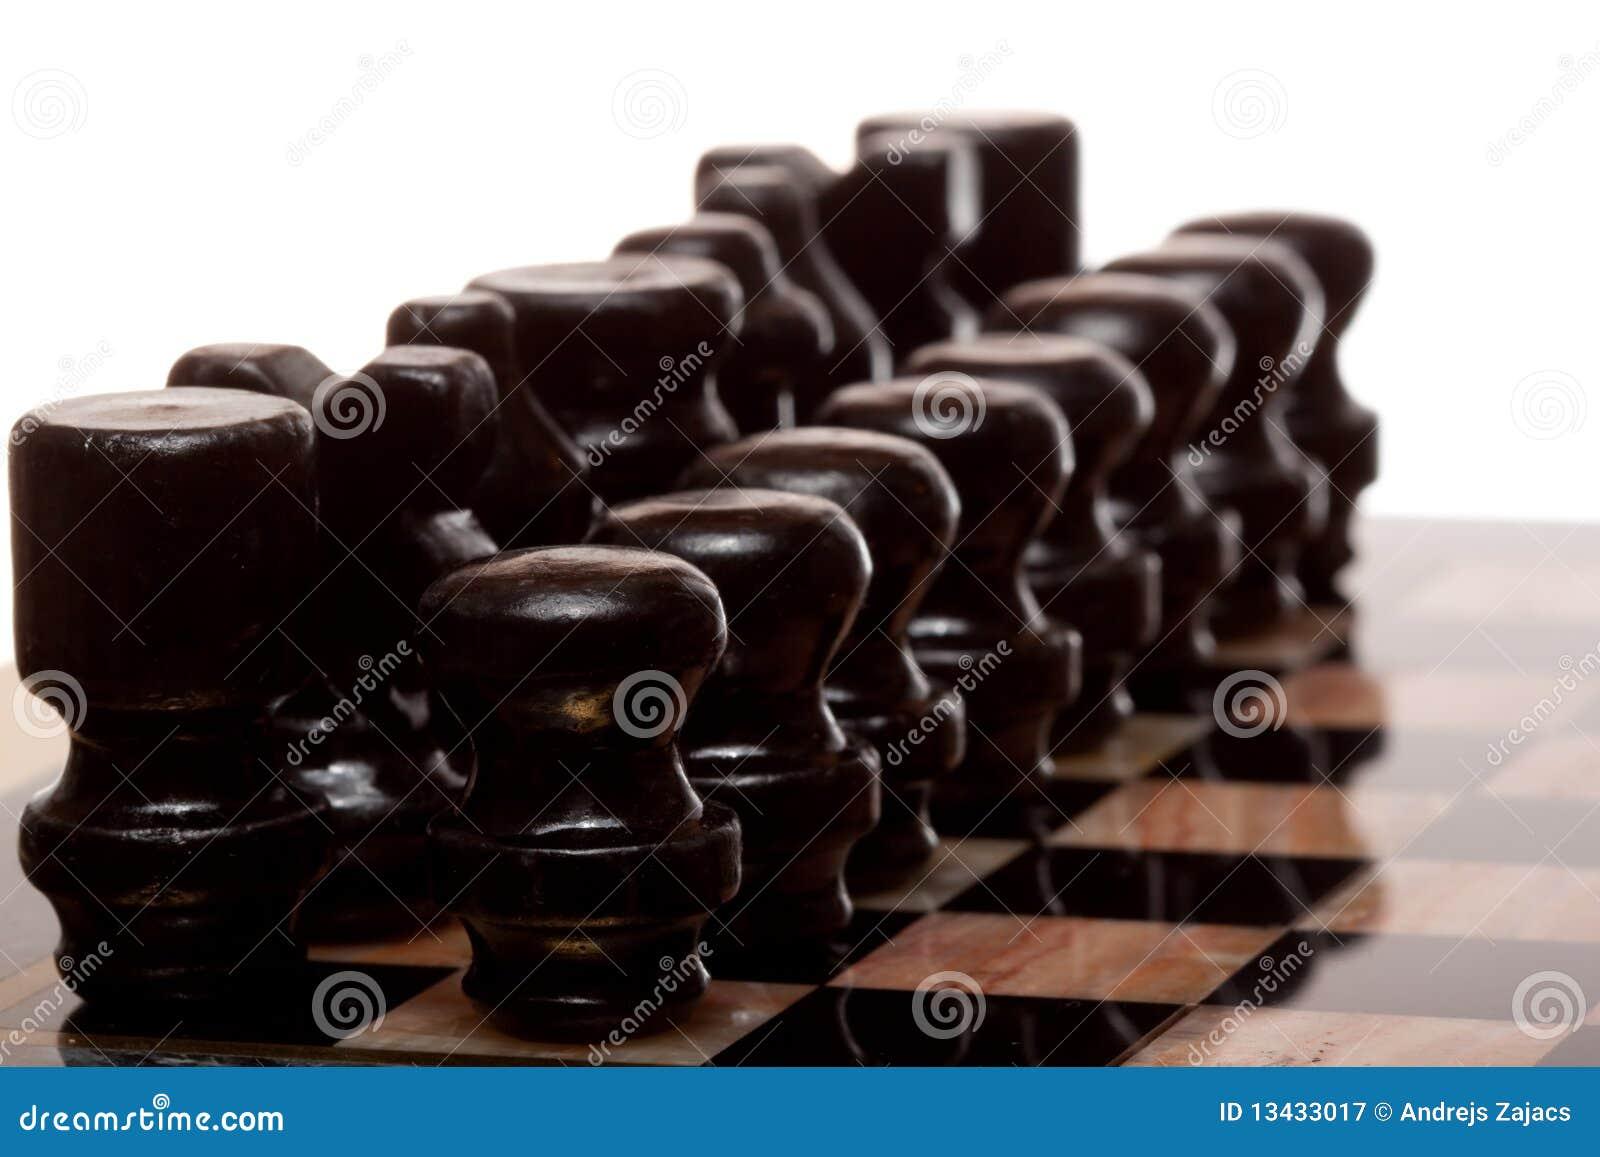 Chessmans noirs